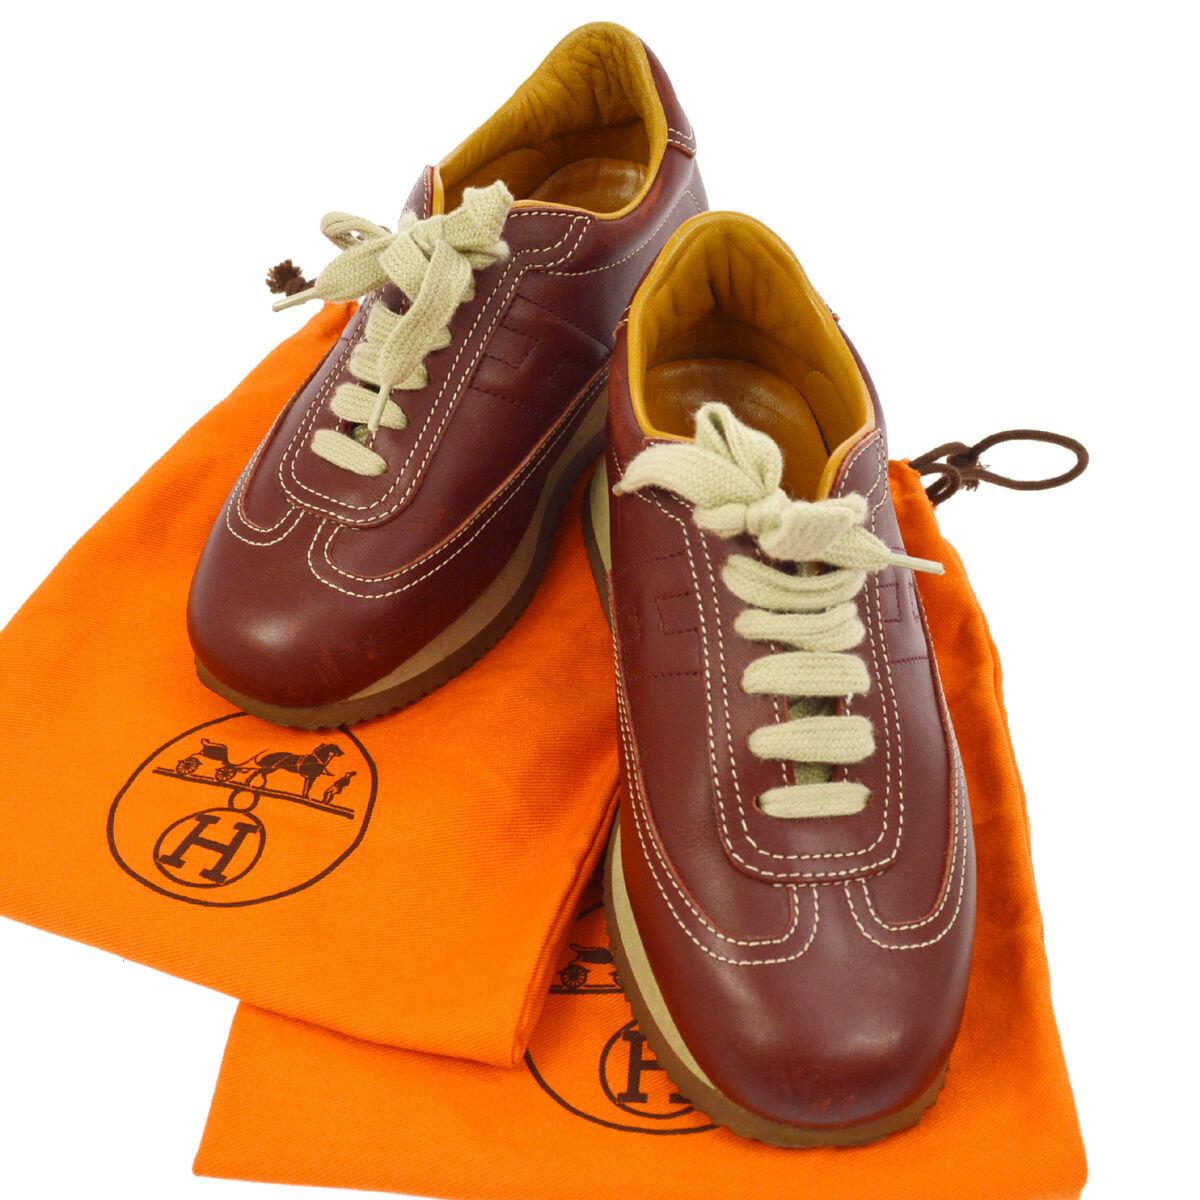 offerta speciale Authentic HERMES Vintage scarpe da ginnastica scarpe Marrone Marrone Marrone Leather  RK12395  Prezzo al piano